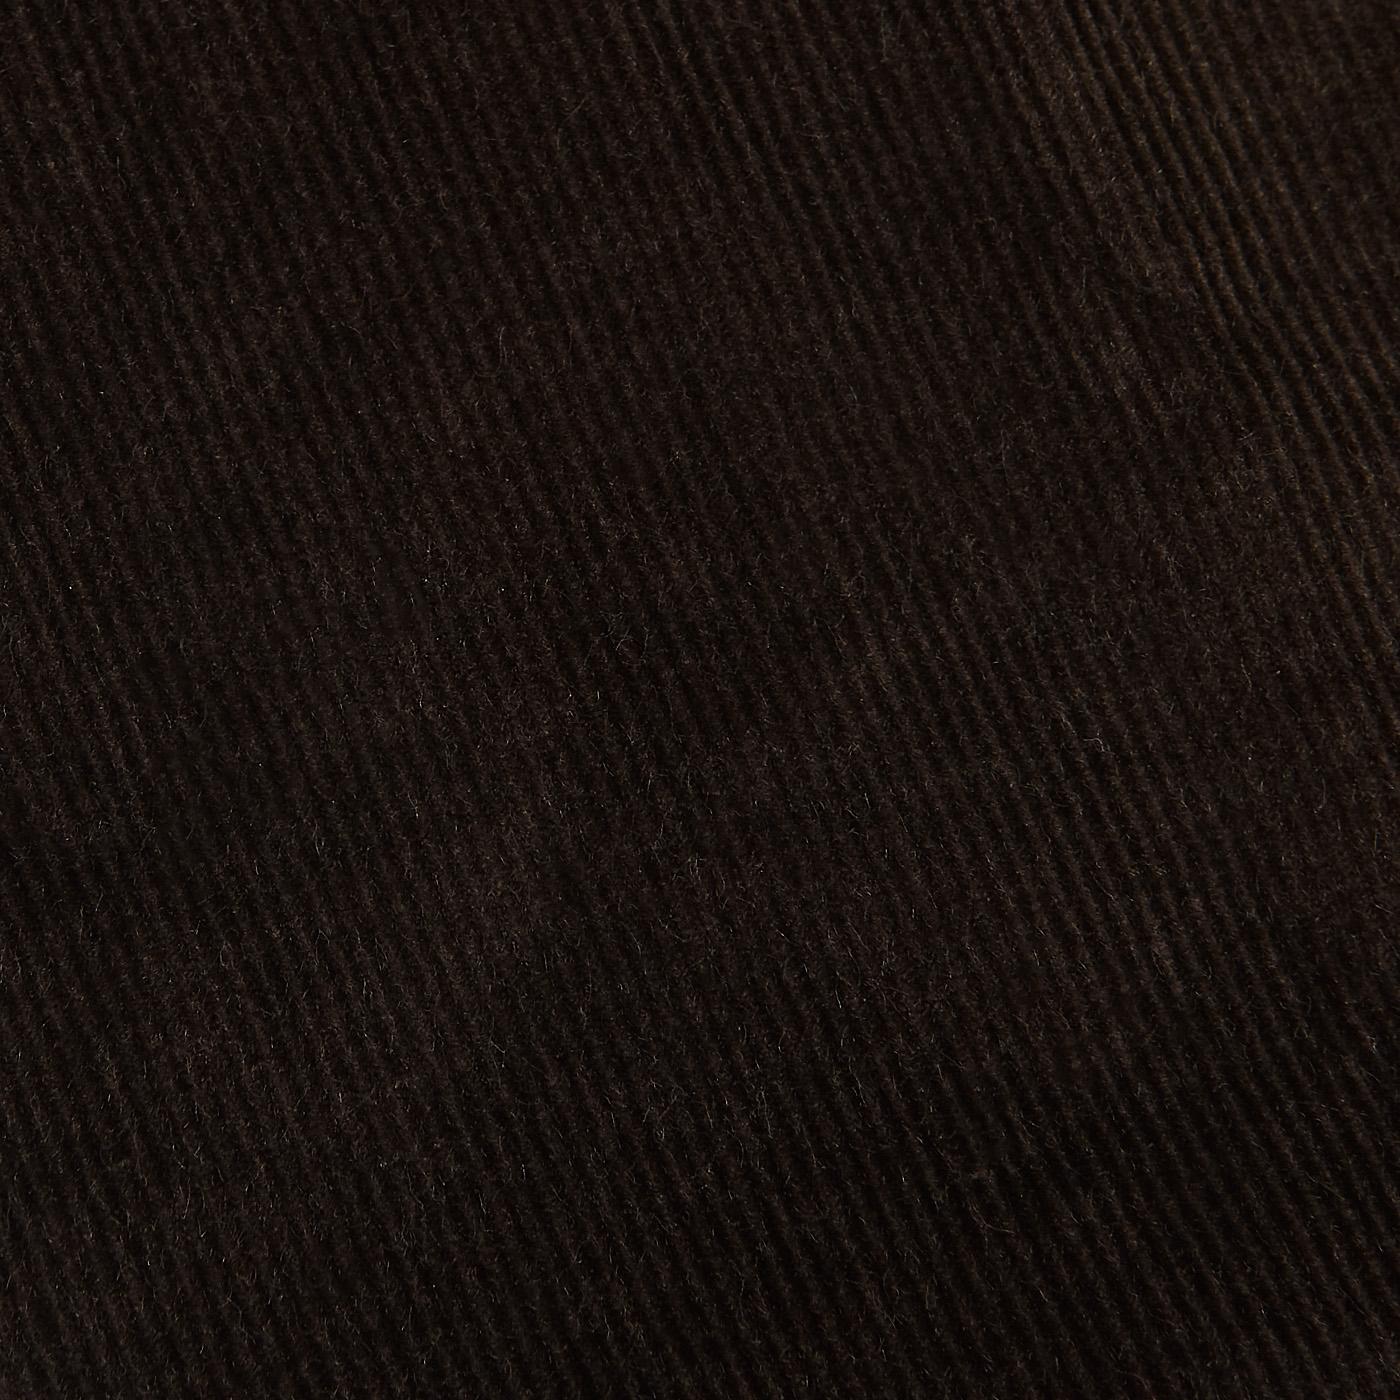 Hiltl Brown Cotton Corduroy Regular Fit Chinos Fabric